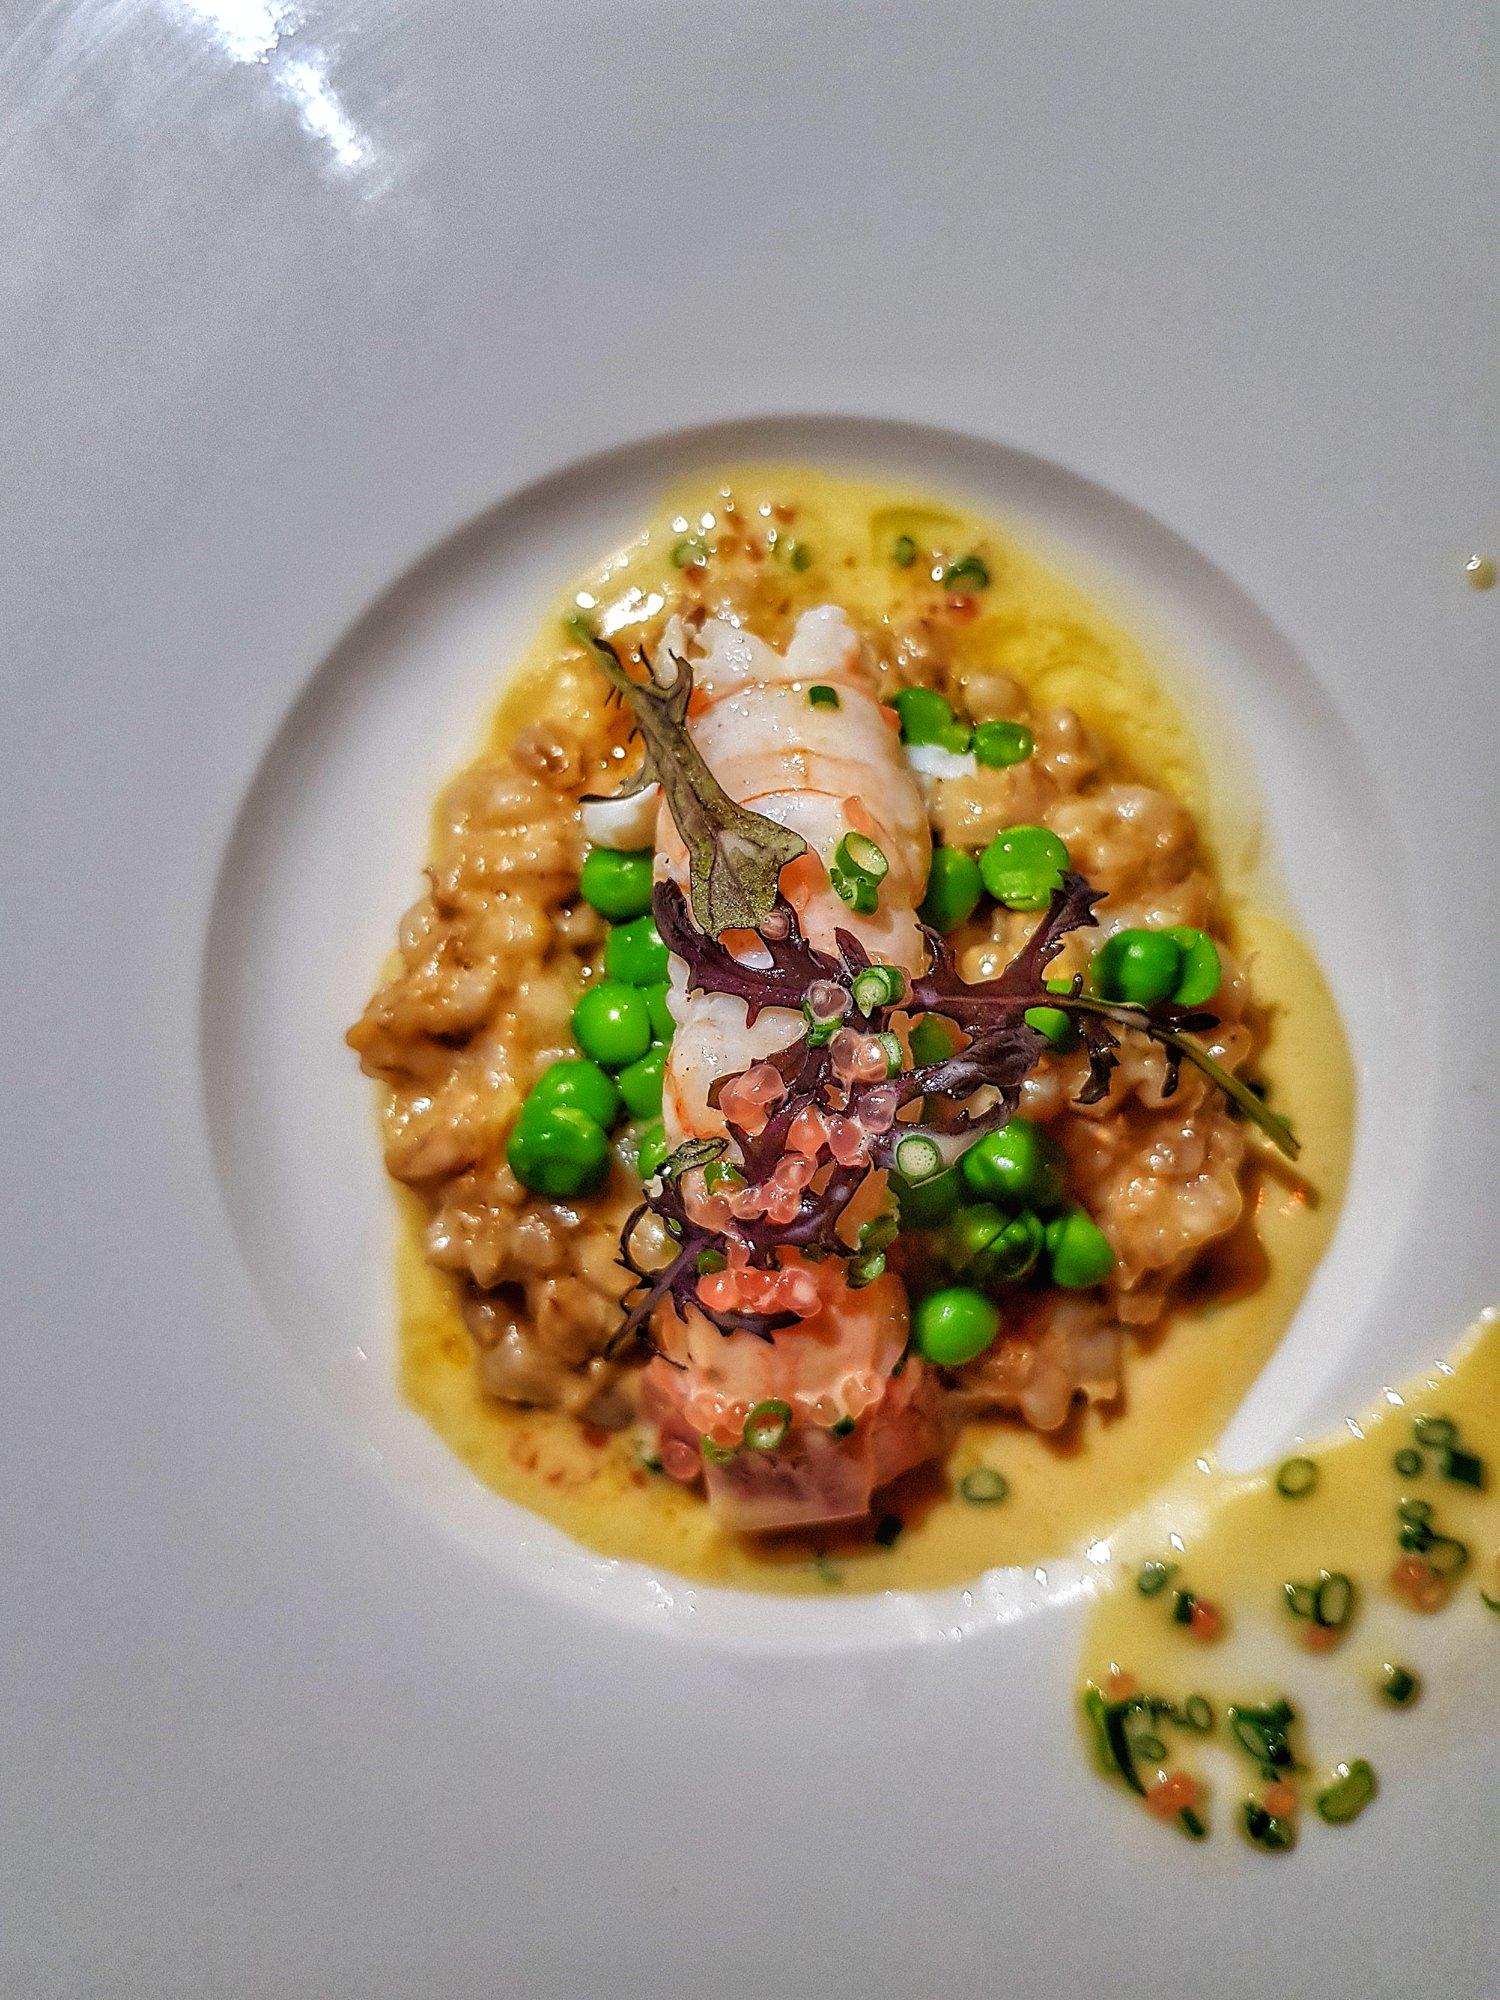 Scampi+from+Restaurant+Dan+Arnold.jpeg